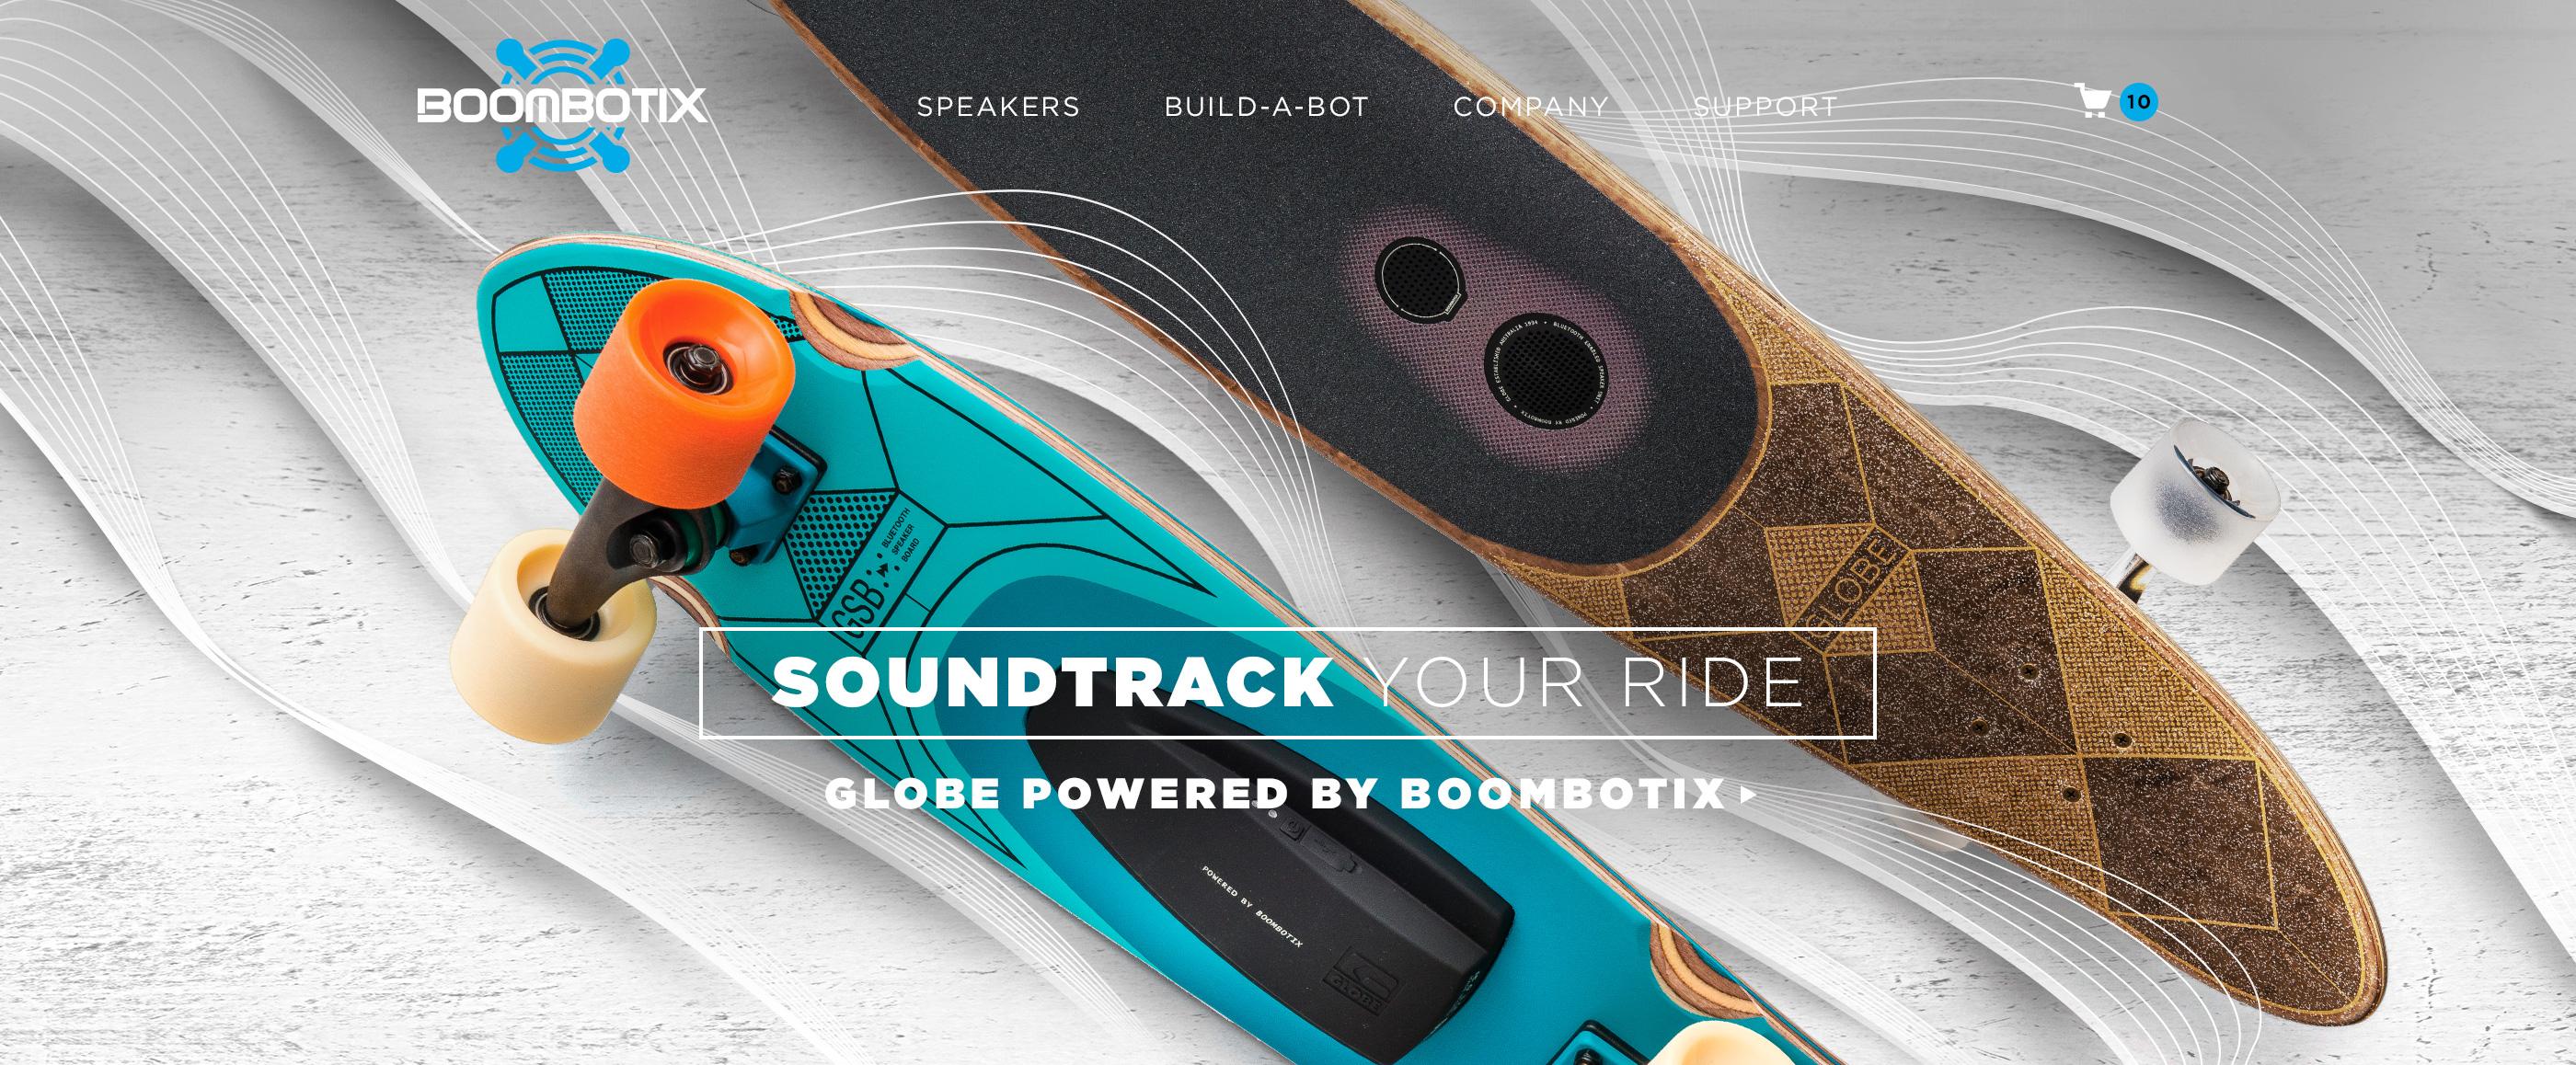 Boombotix banner image for website